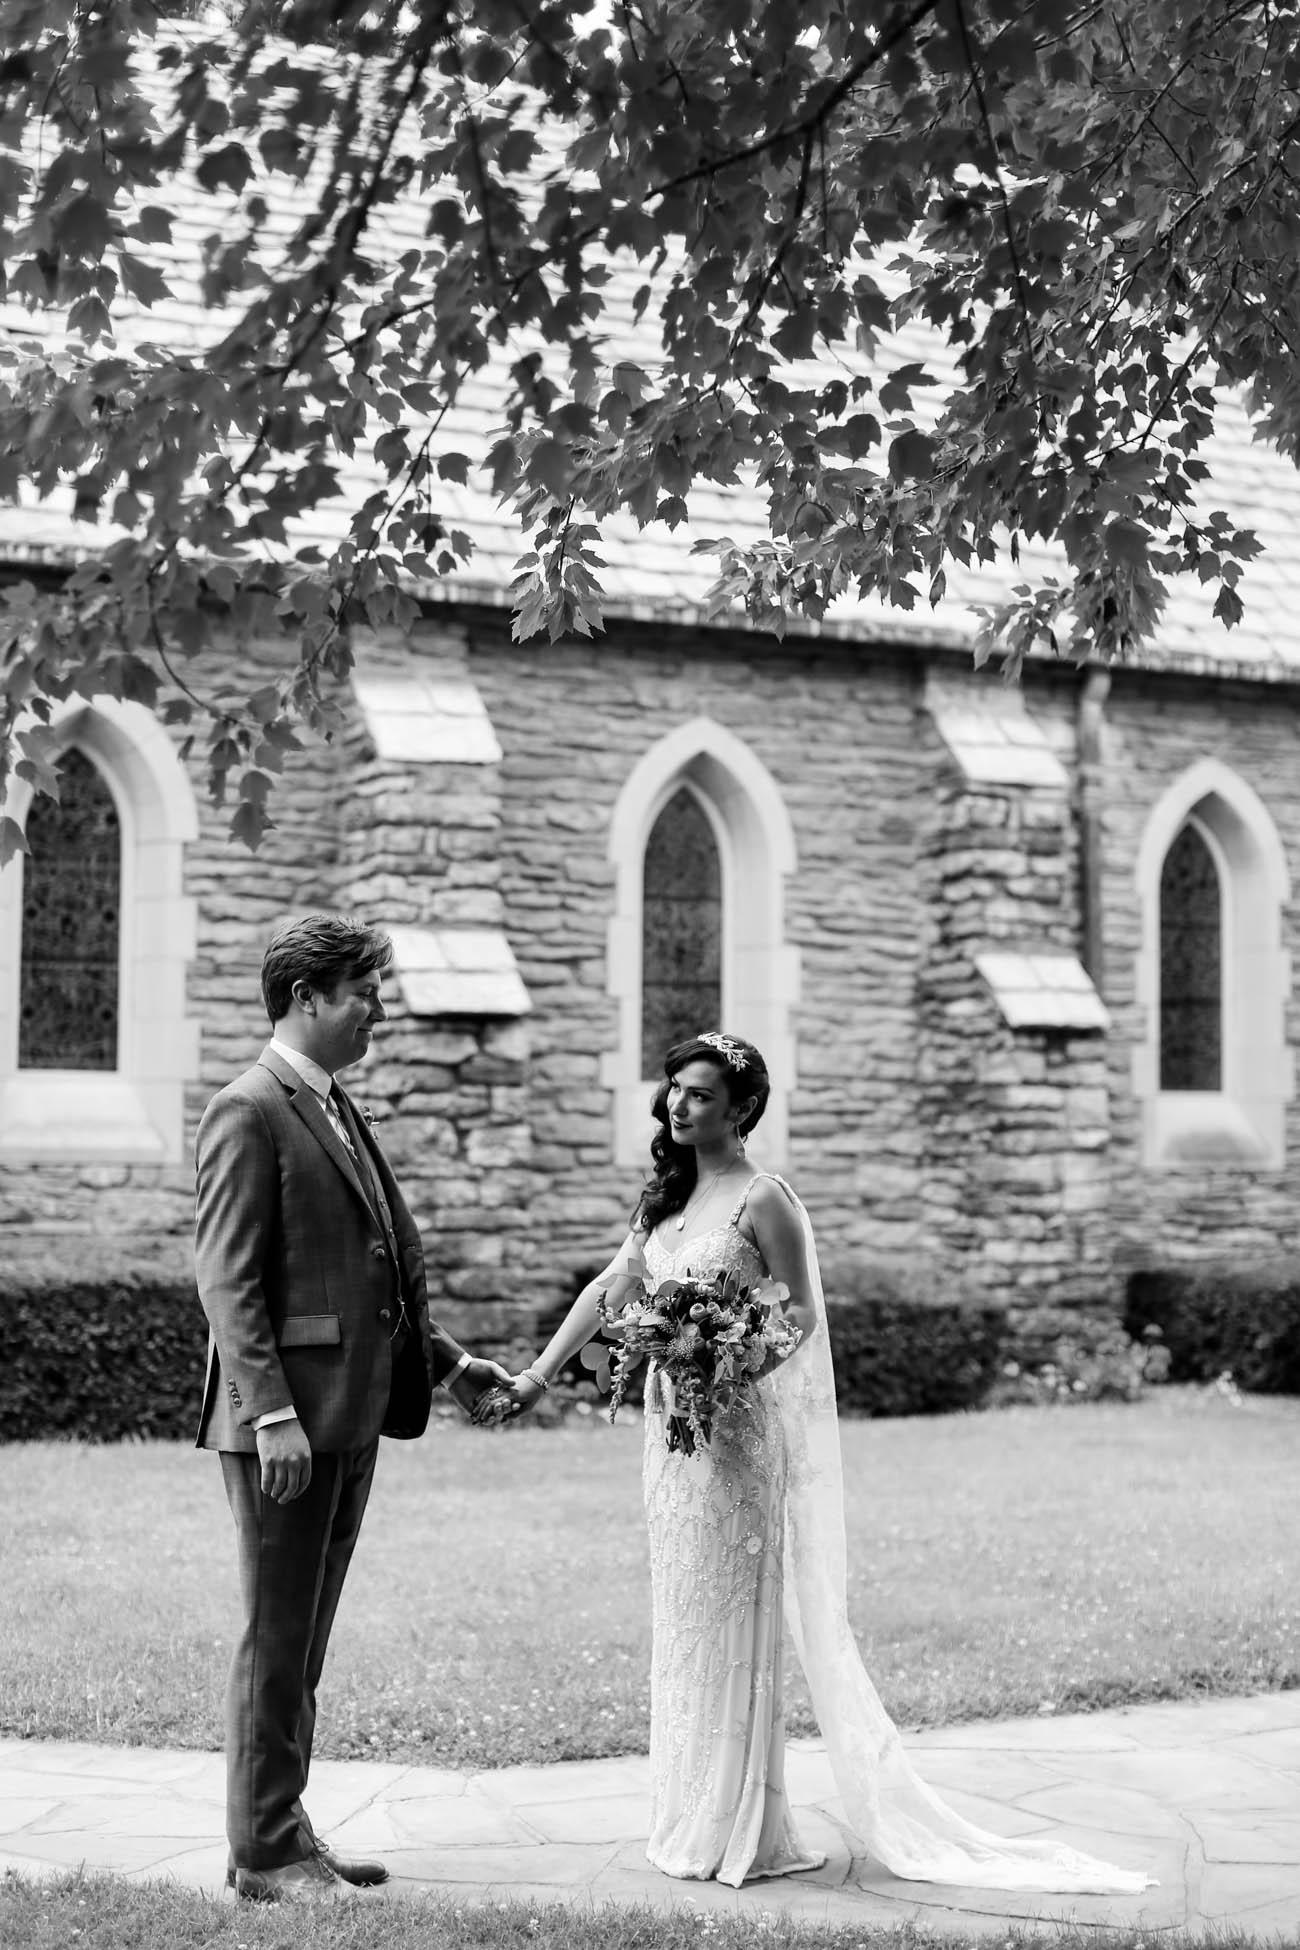 Speakeasy-1920s-theme-Louisville-and-Lexington Wedding-73.jpg